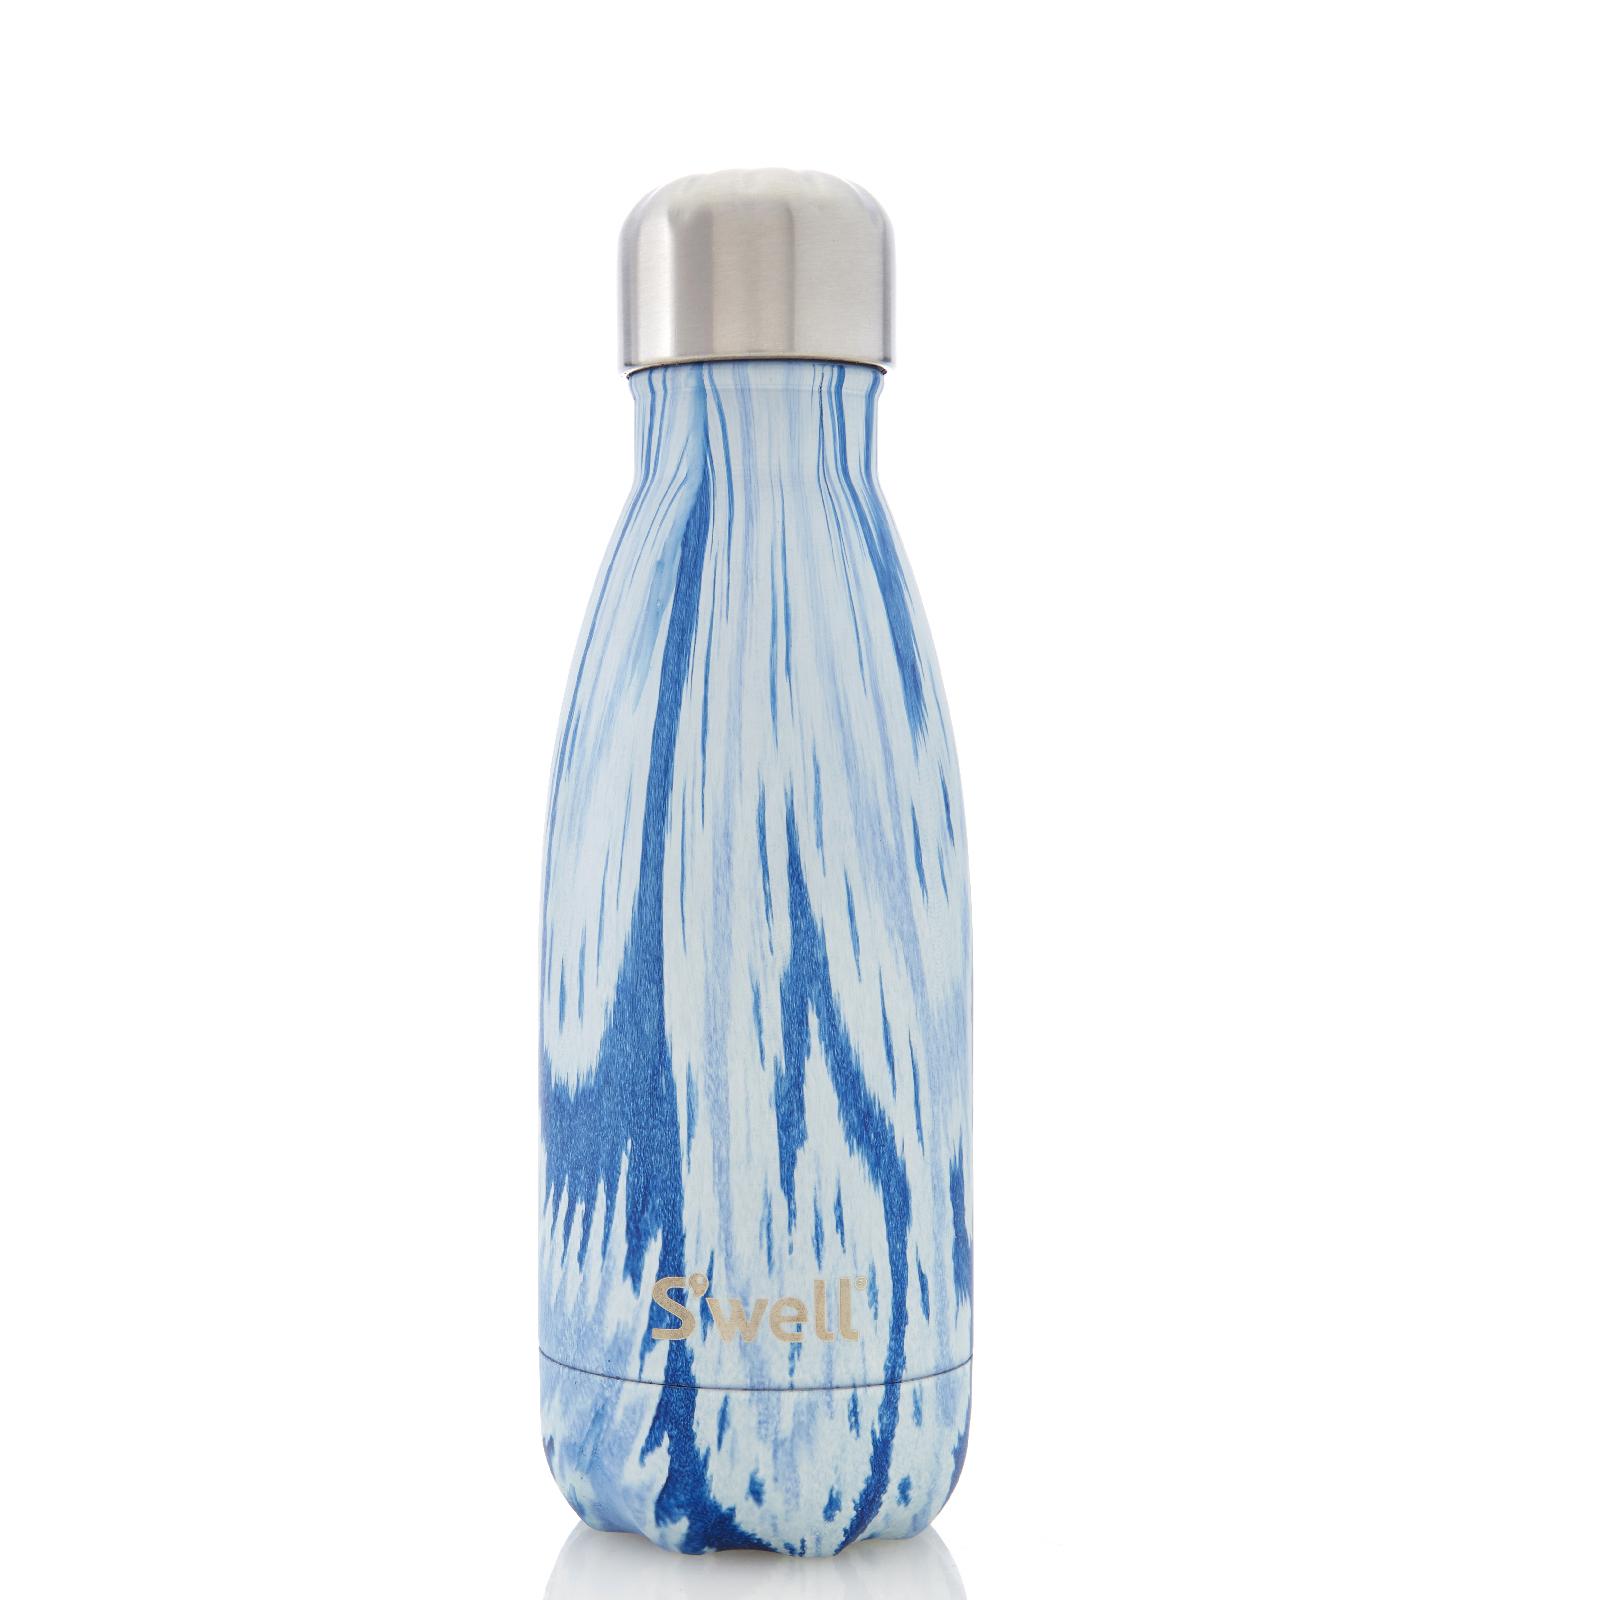 S'well 260ml Santorini 保温水瓶